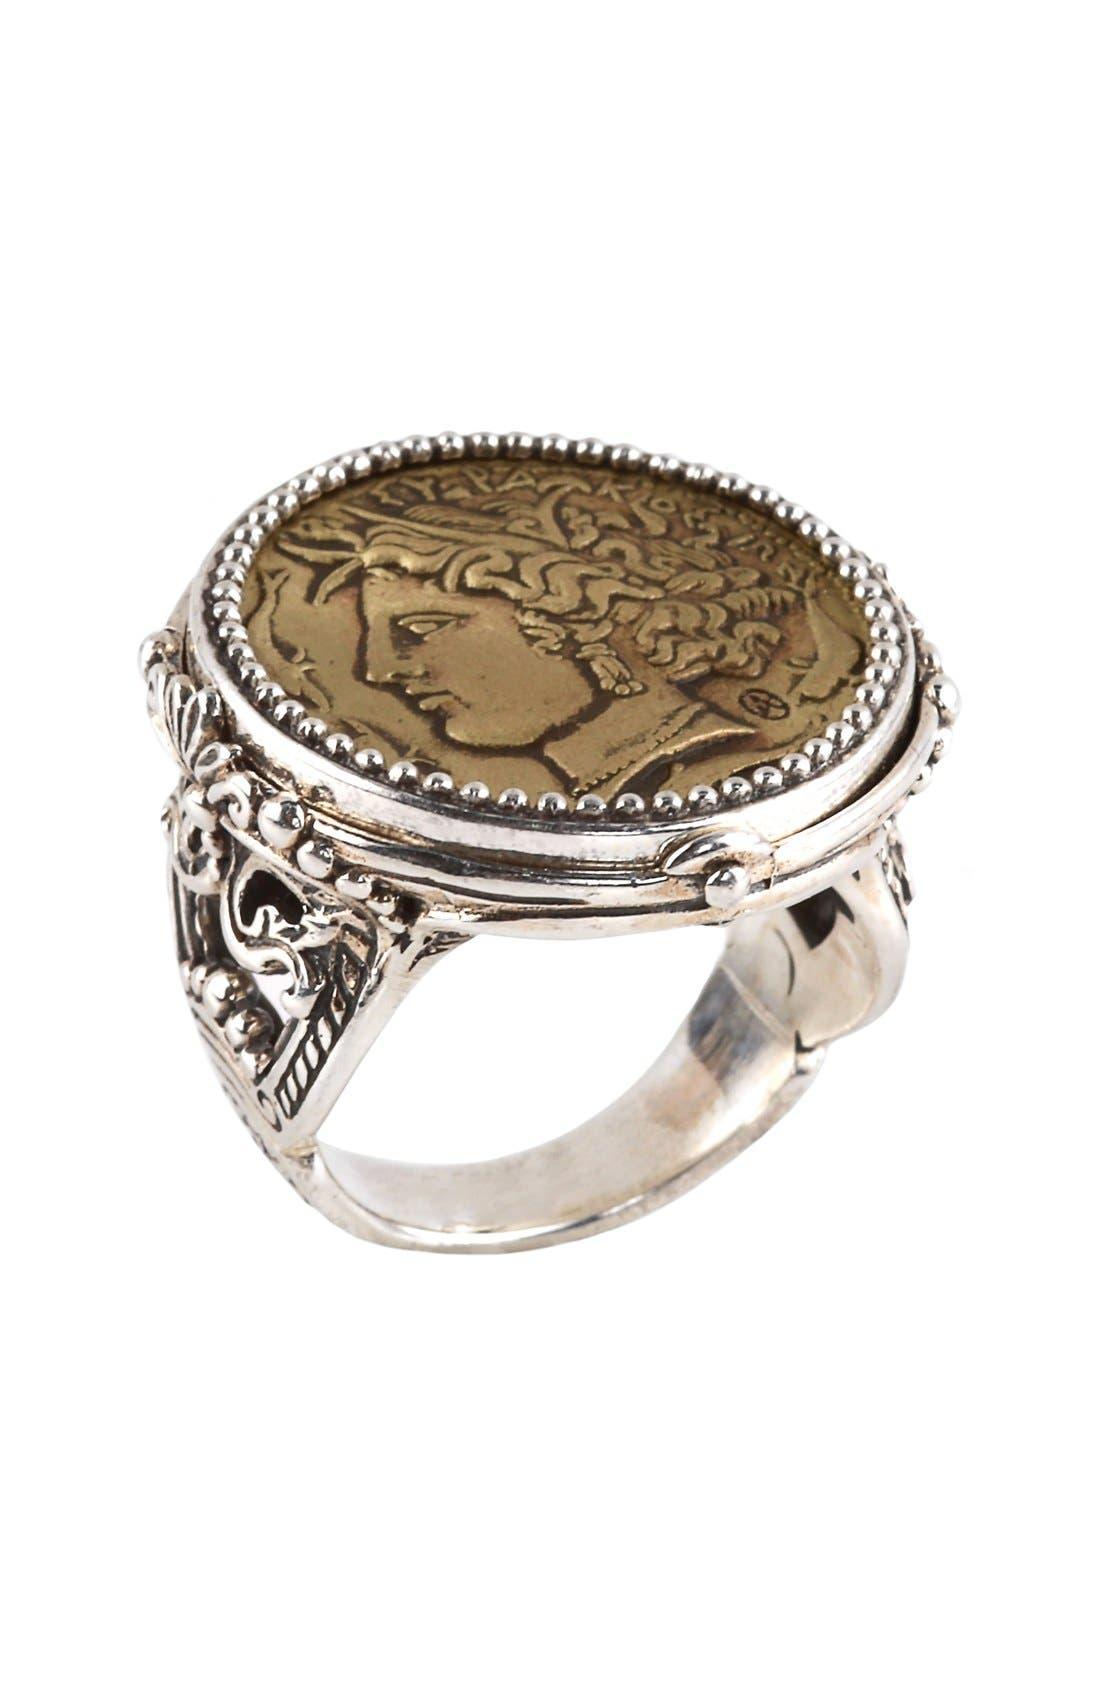 Alternate Image 1 Selected - Konstantino 'Arethusa' Coin Ring